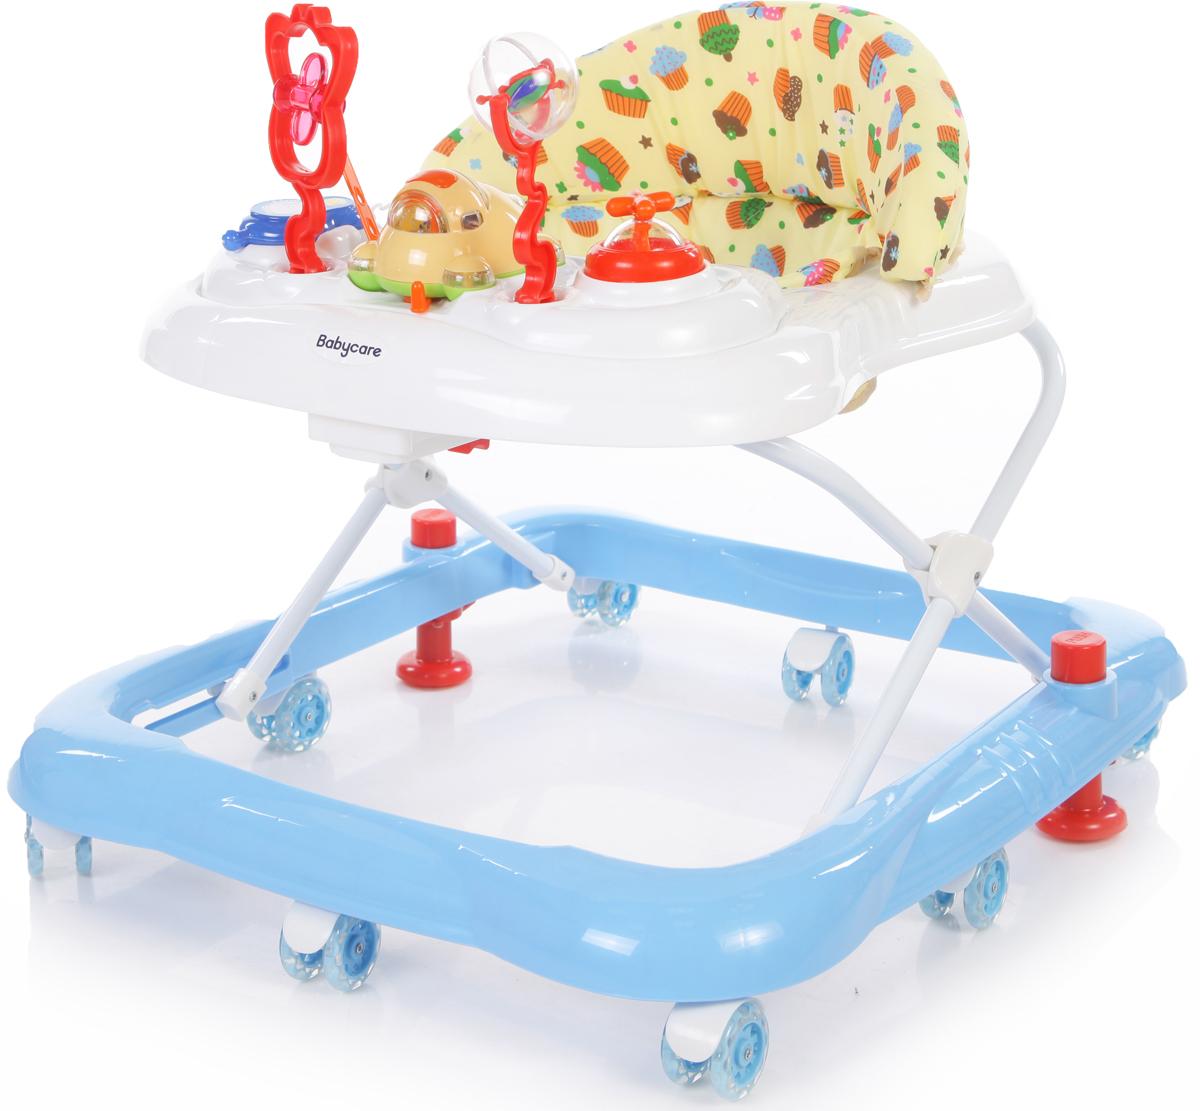 ходунки Baby Care Ходунки Mario цвет белый синий